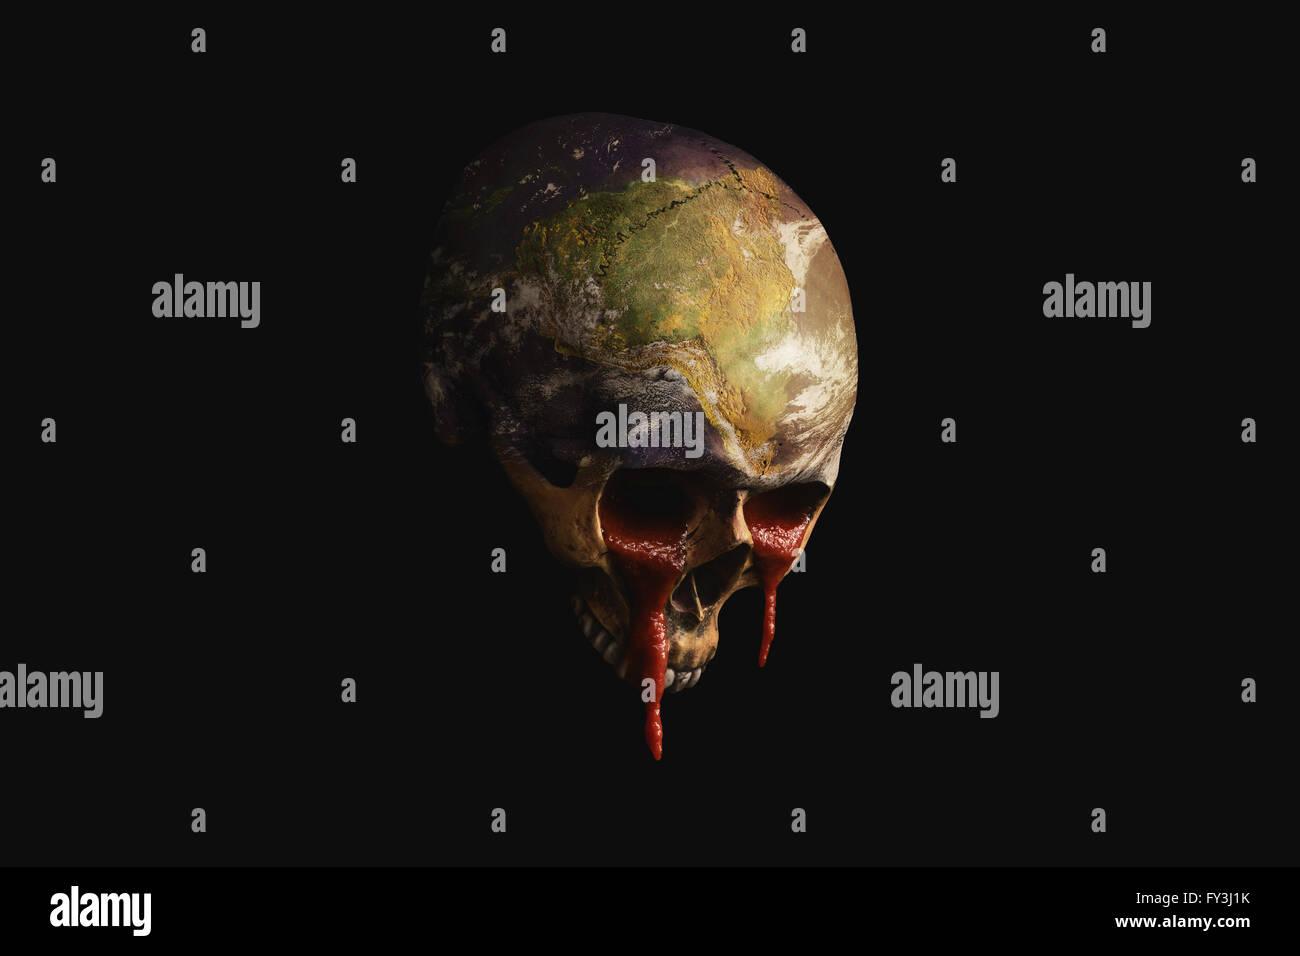 Sterbende Erde läuft Blut aus der Nase Stockbild